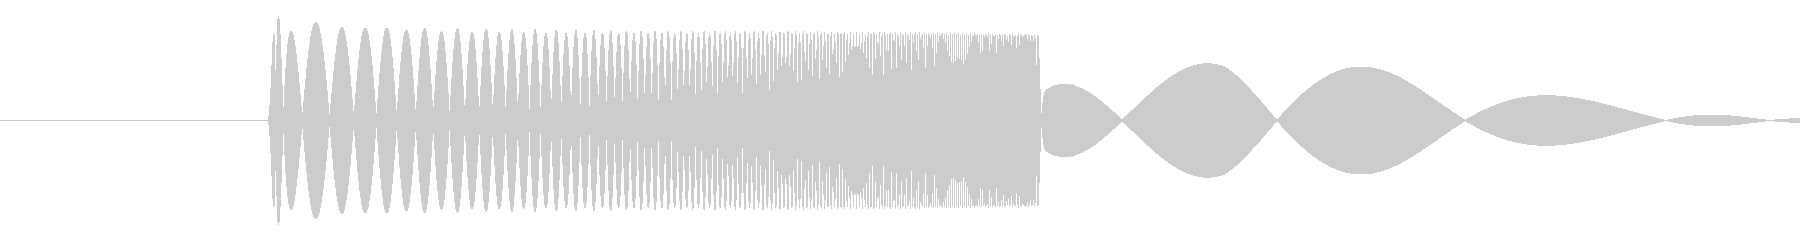 skypeの起動音みたいな音3 ポヨン♡の未再生の波形